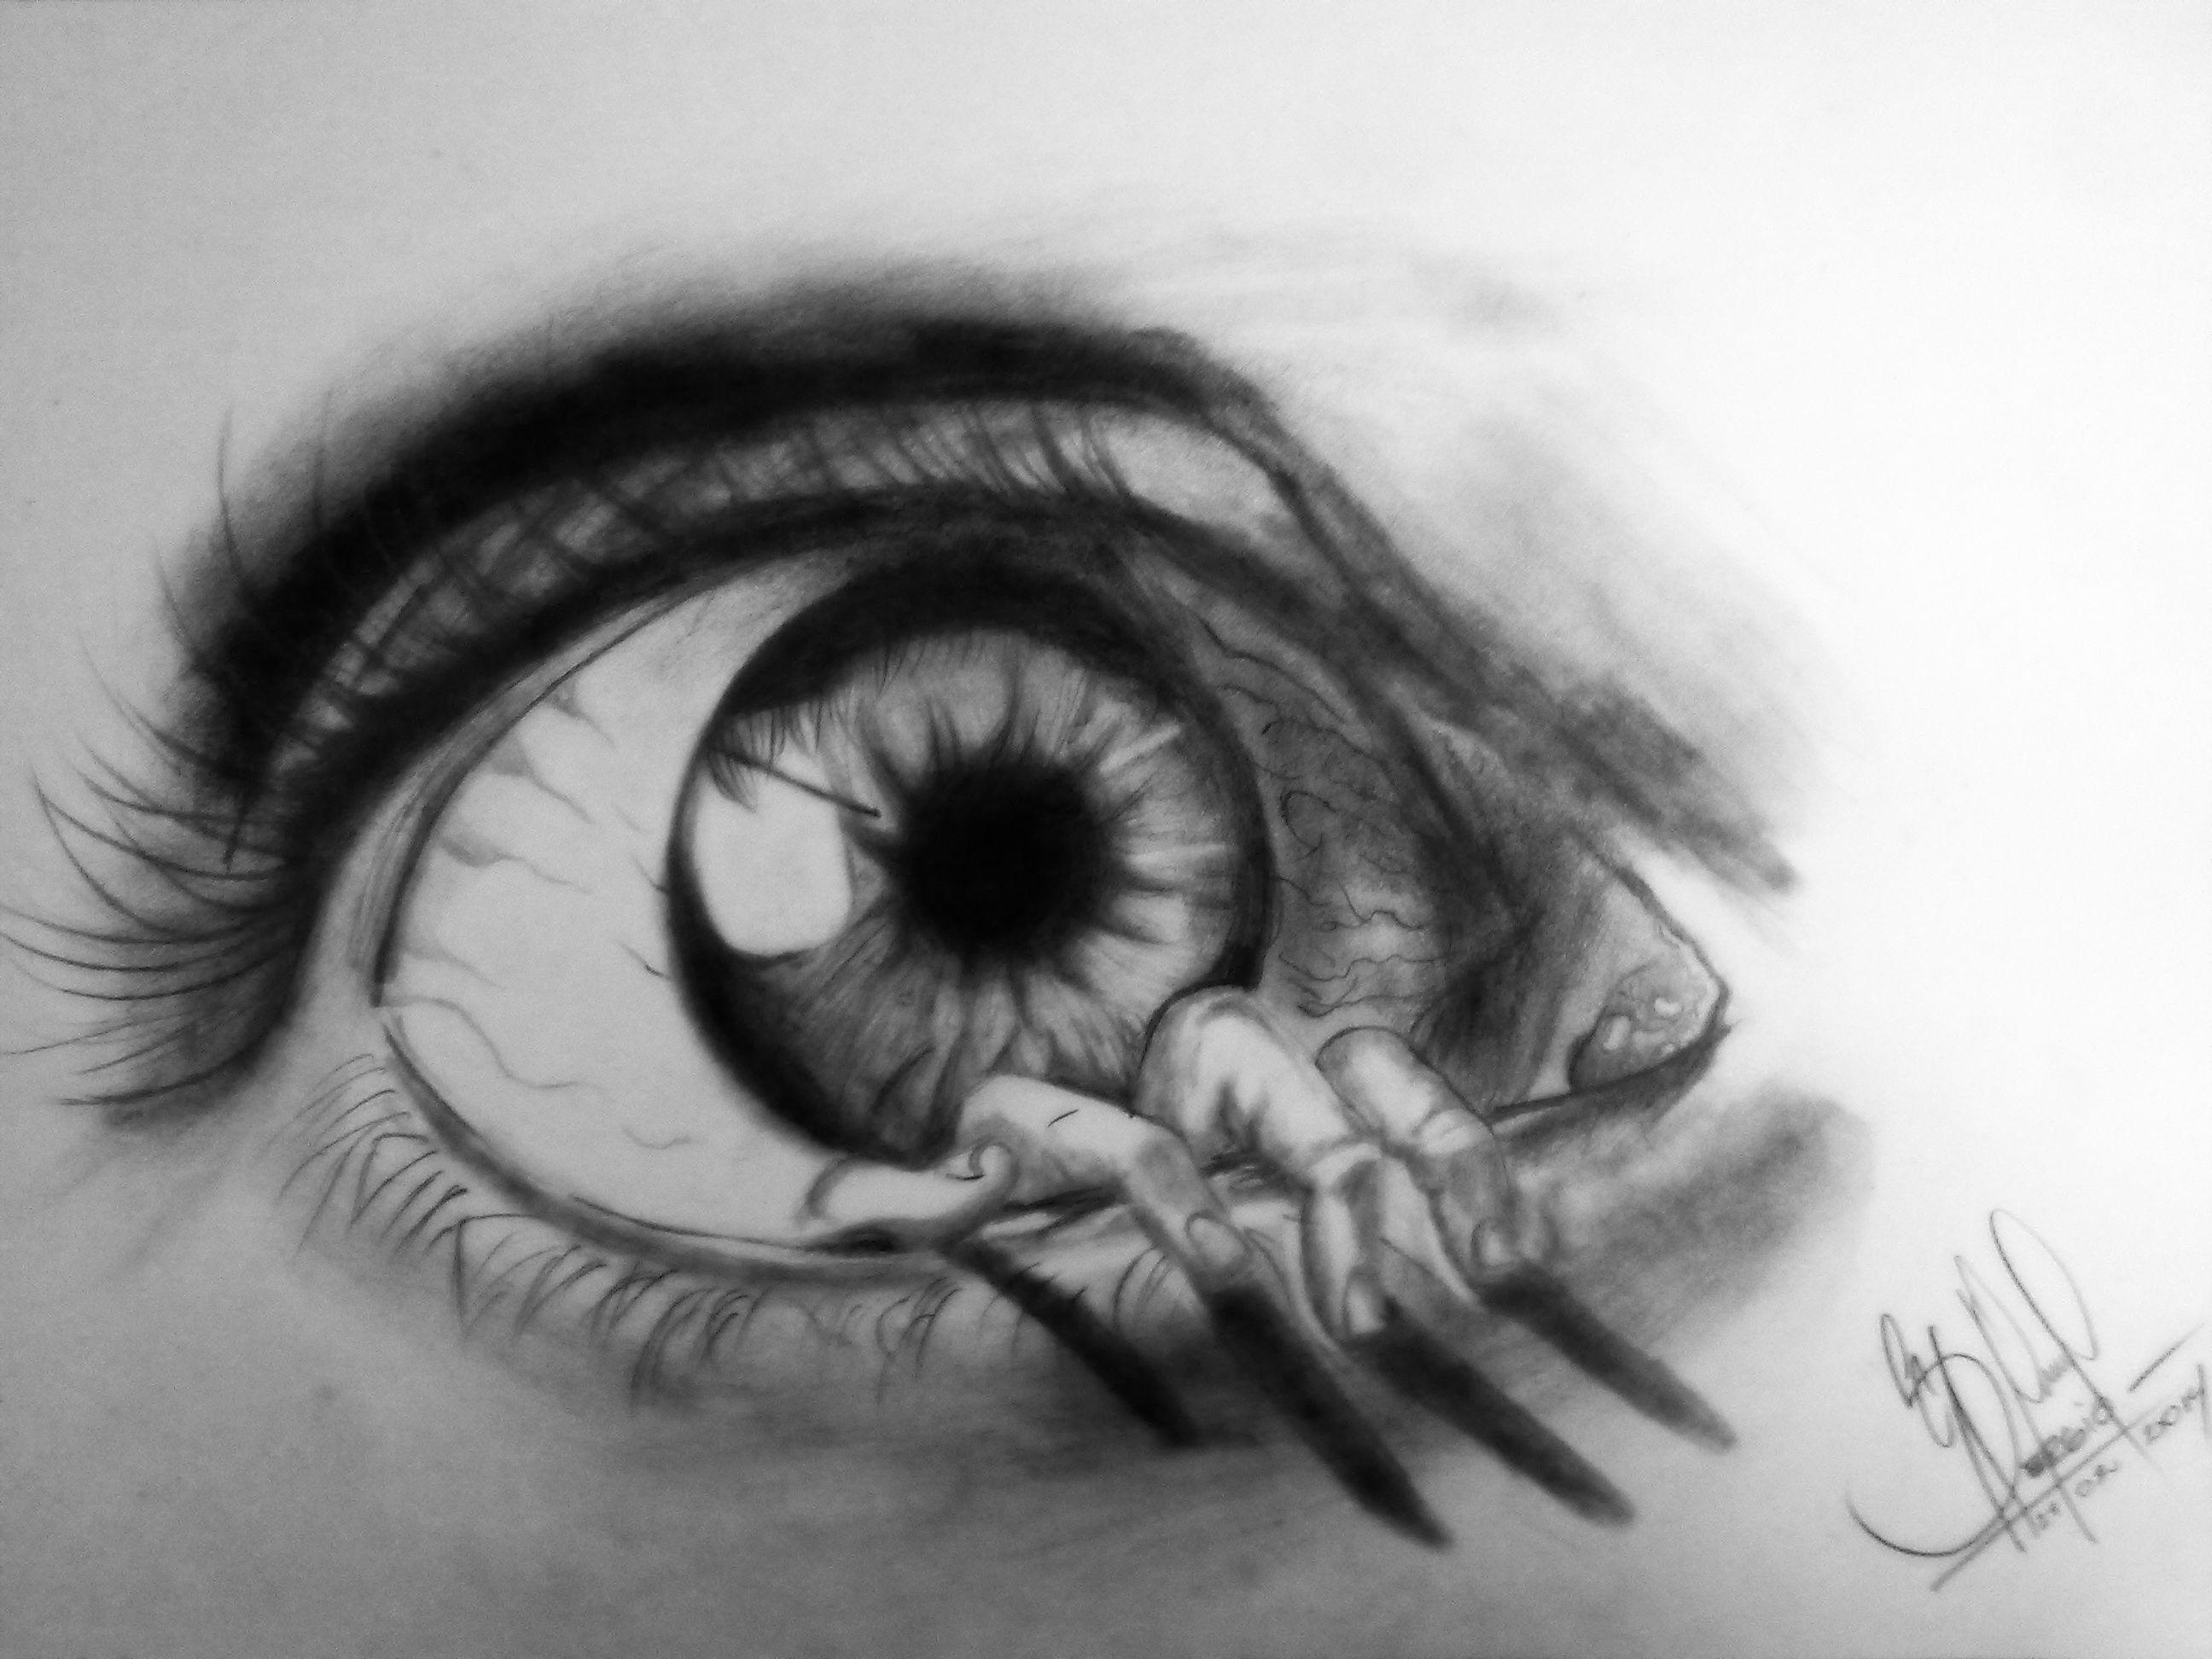 Dibujos Para Colorear Realistas: Ojo A Lapiz 3d Realista